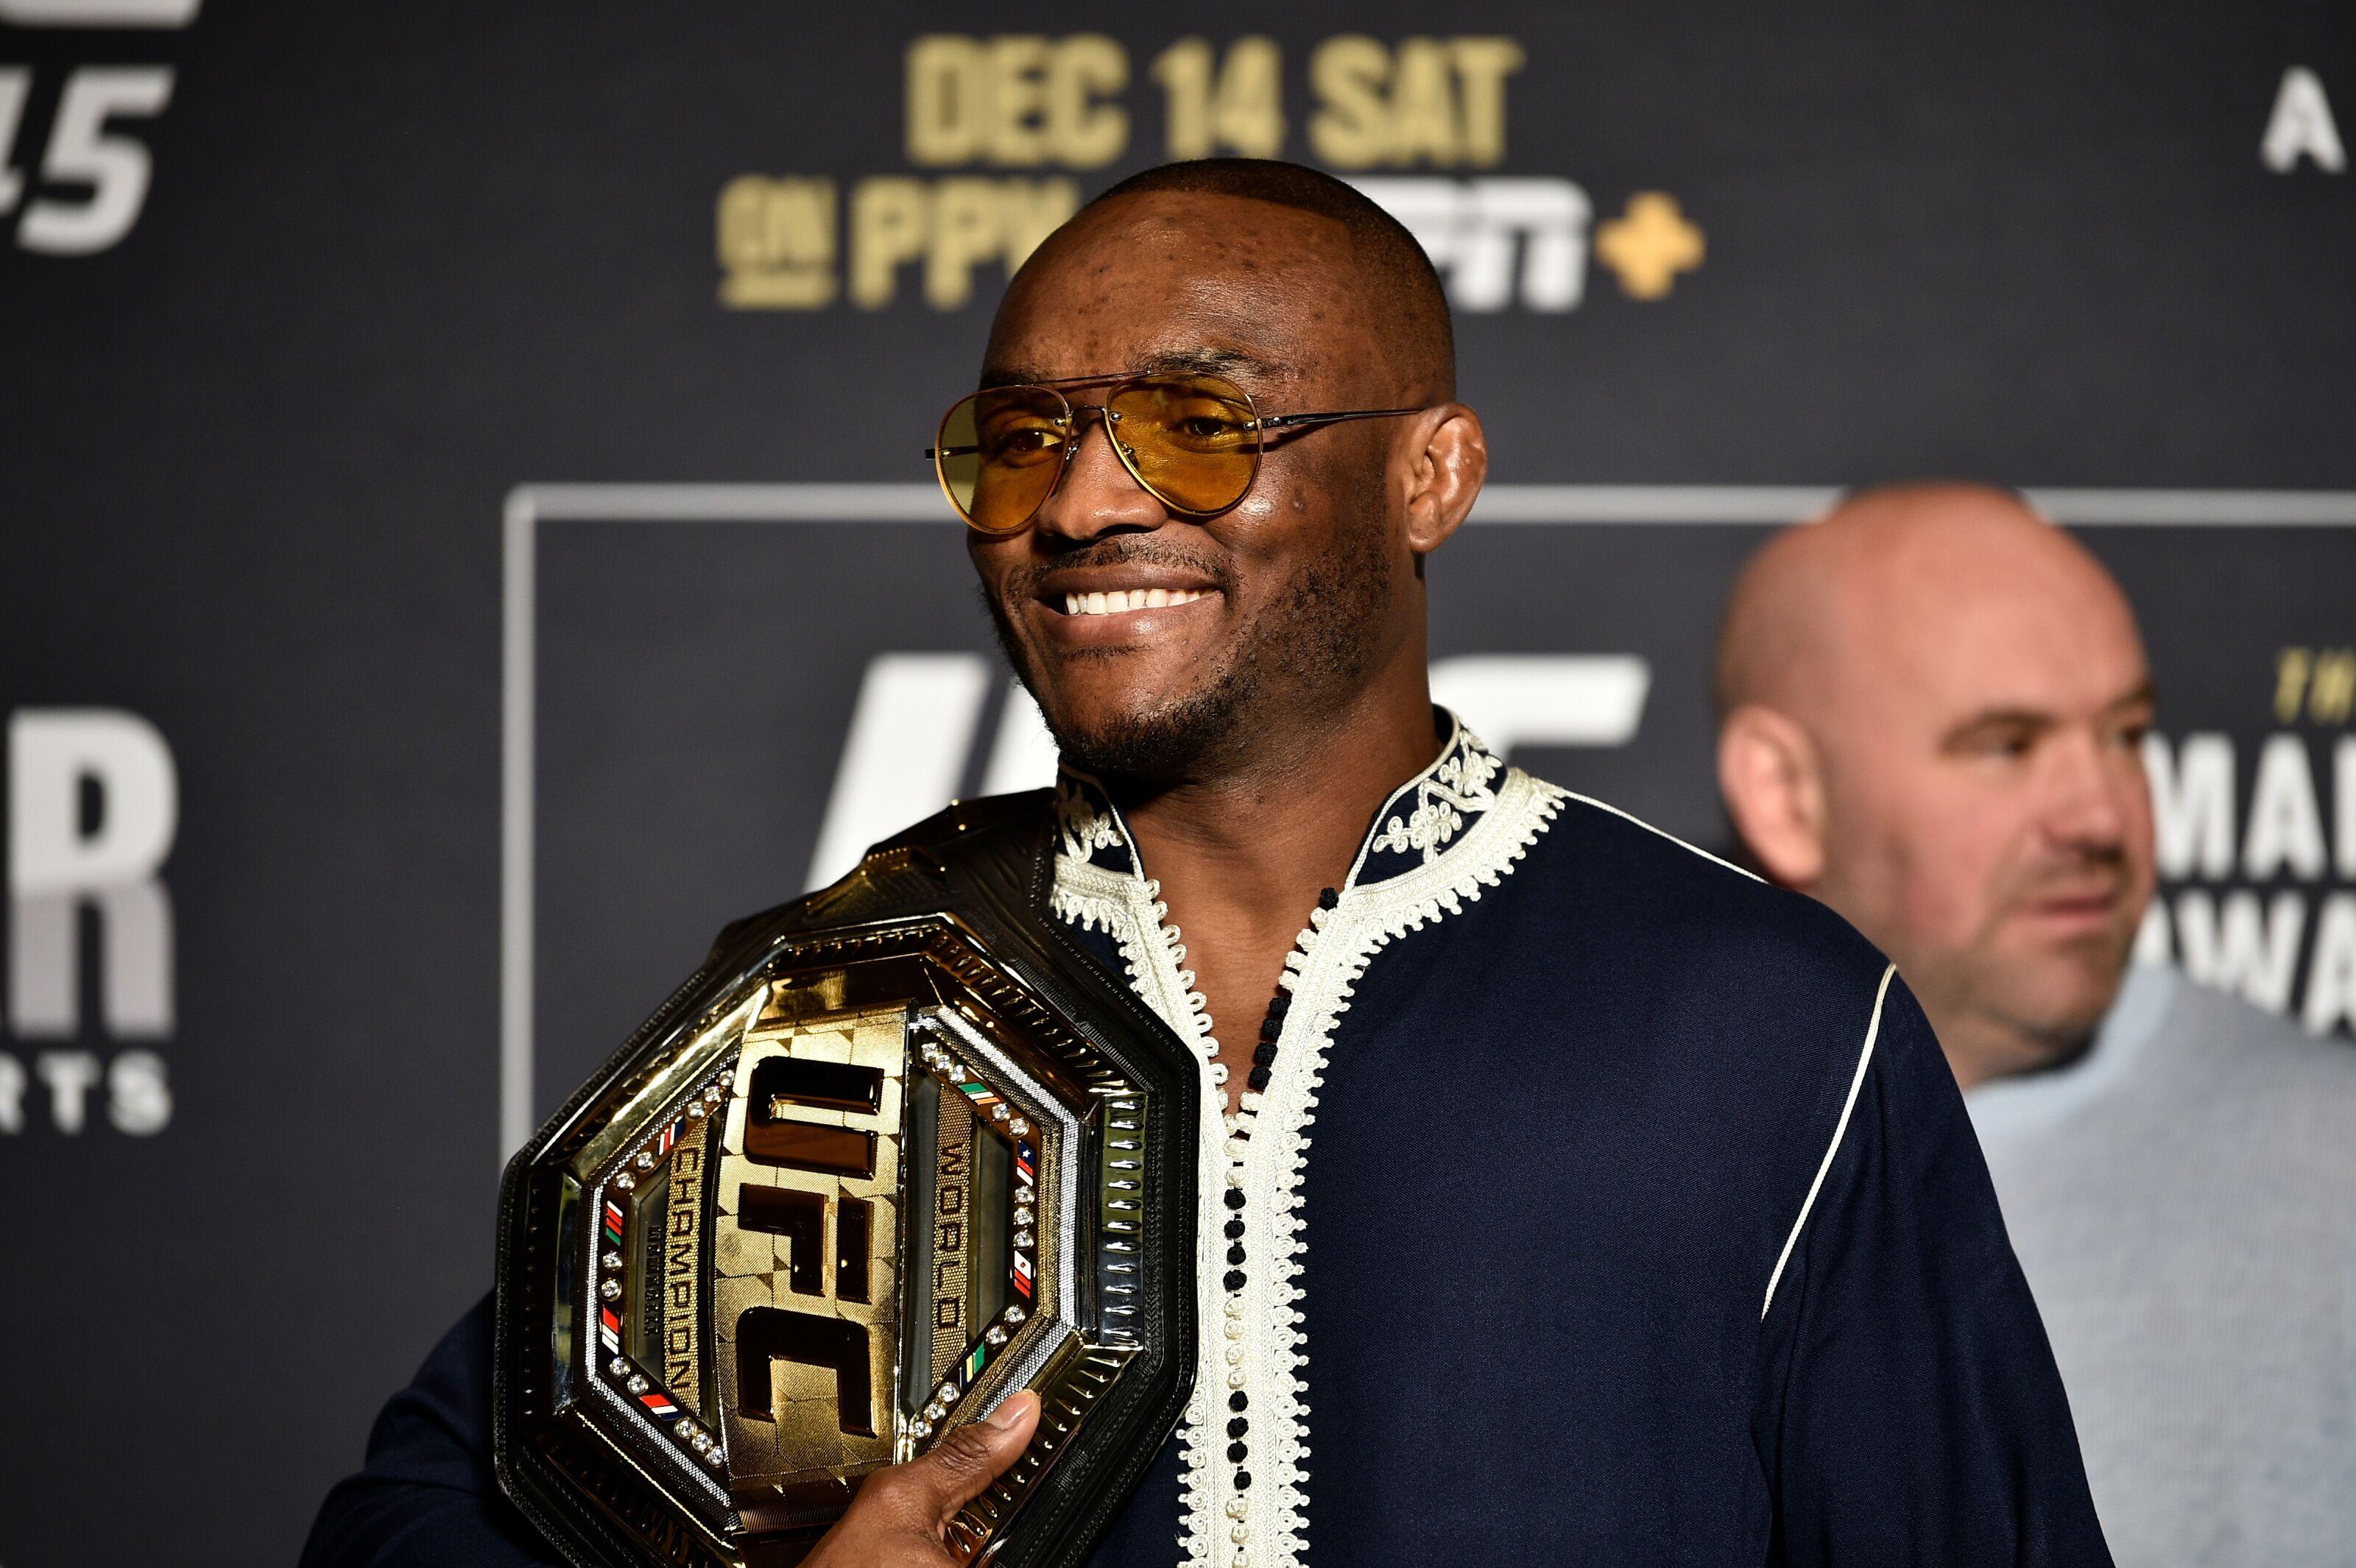 UFC 245 salaries: Kamaru Usman, Colby Covington both biggest earners at $500K